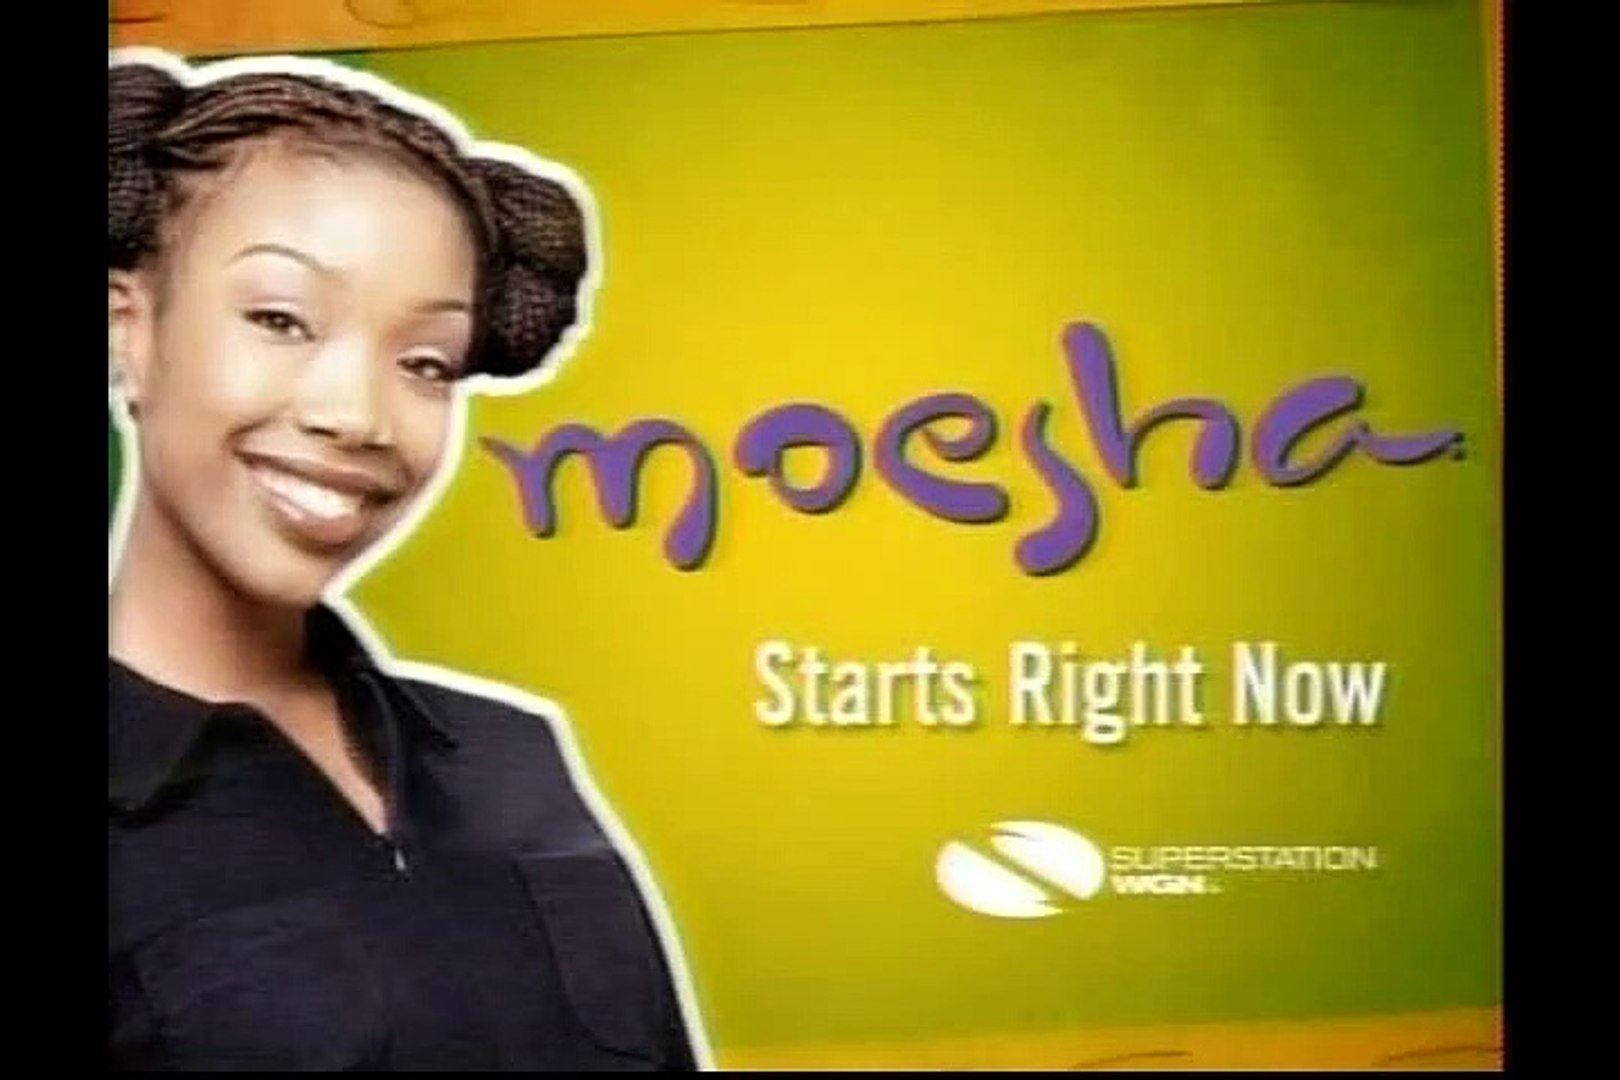 Moesha S06E07 - The Nutty Moesha